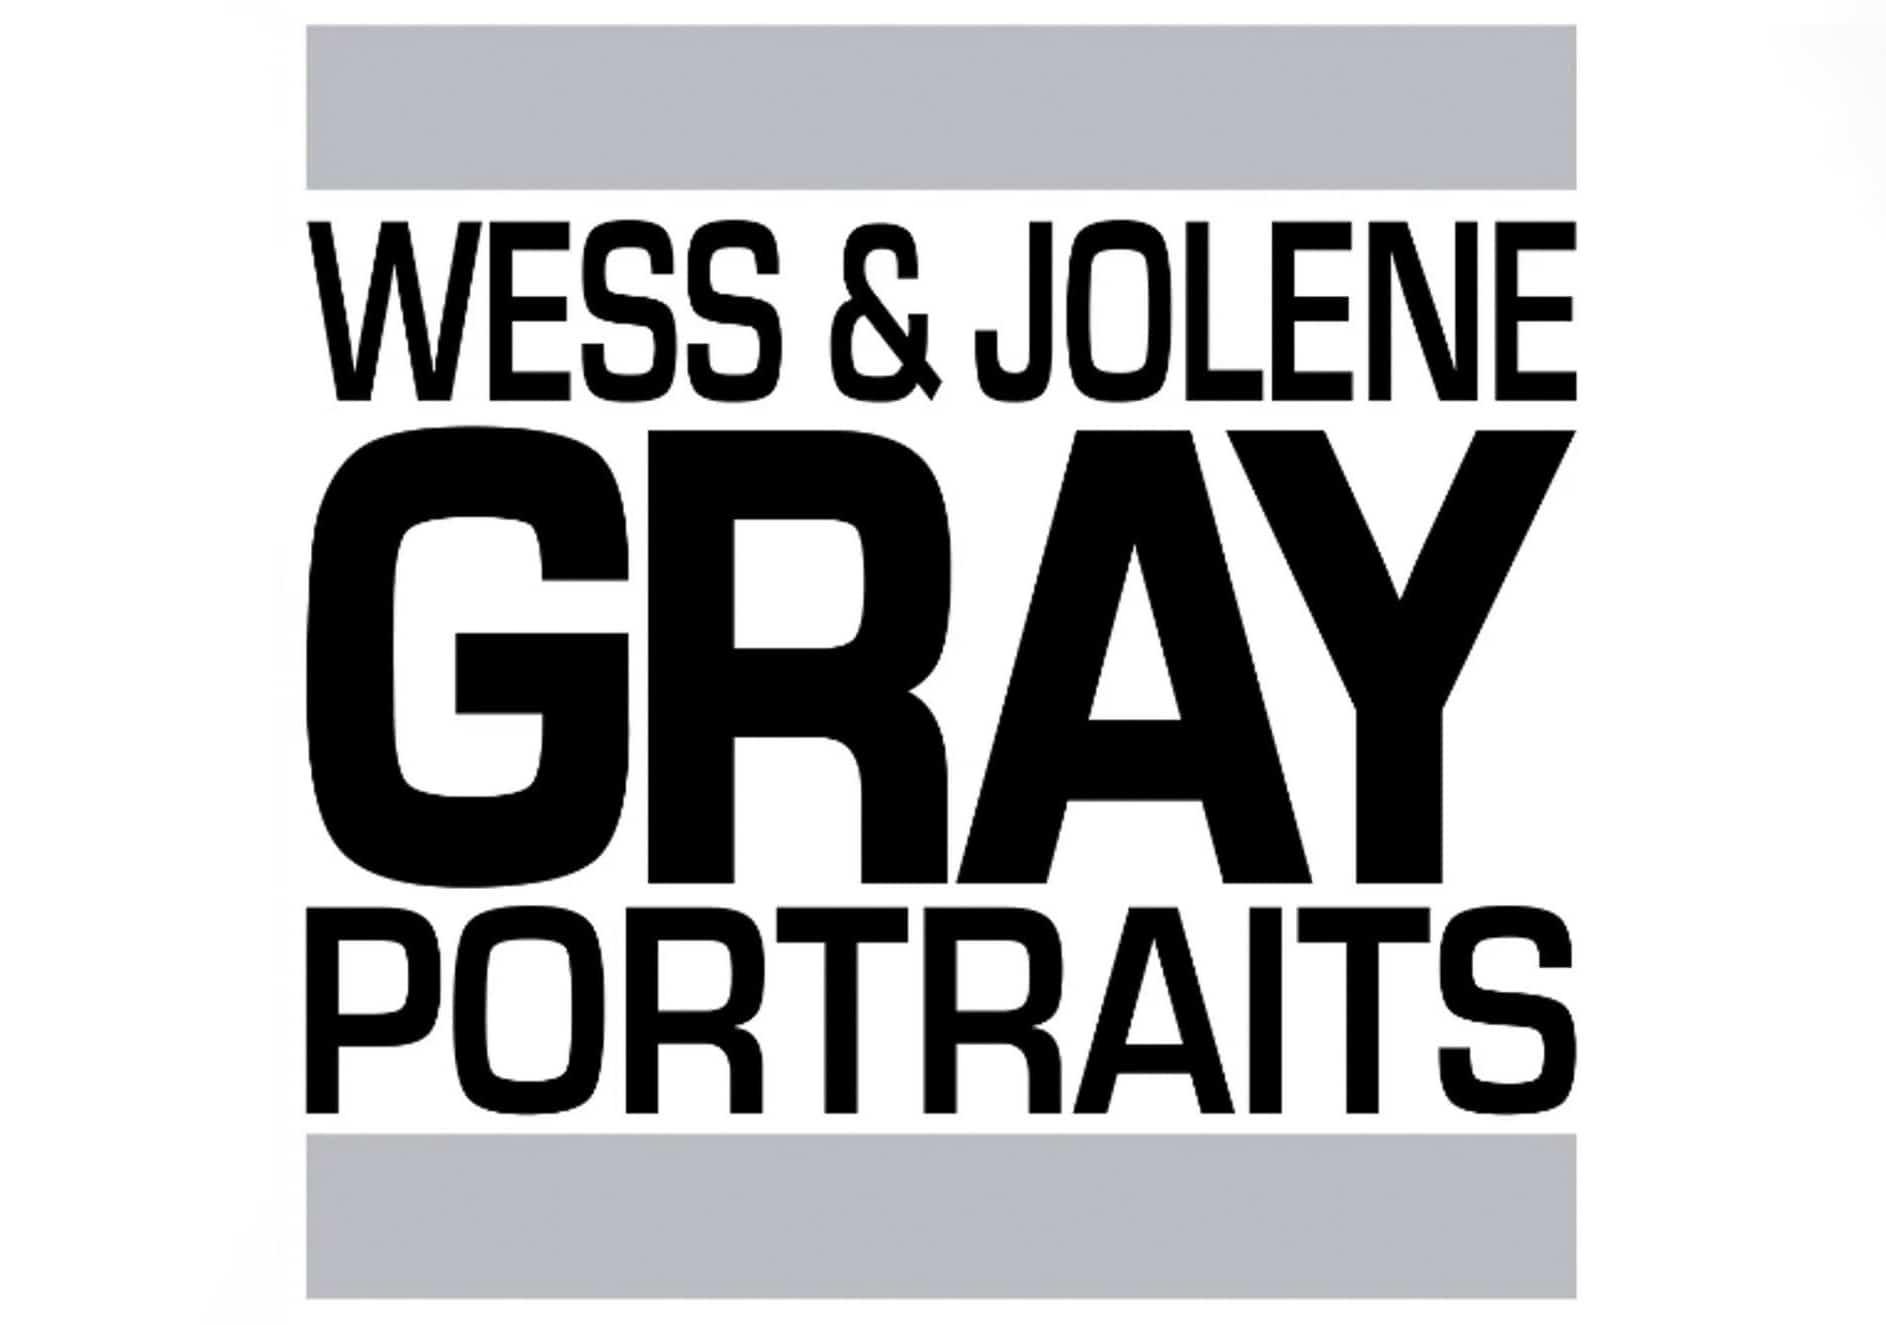 Wess and Jolene Gray Portraits logo